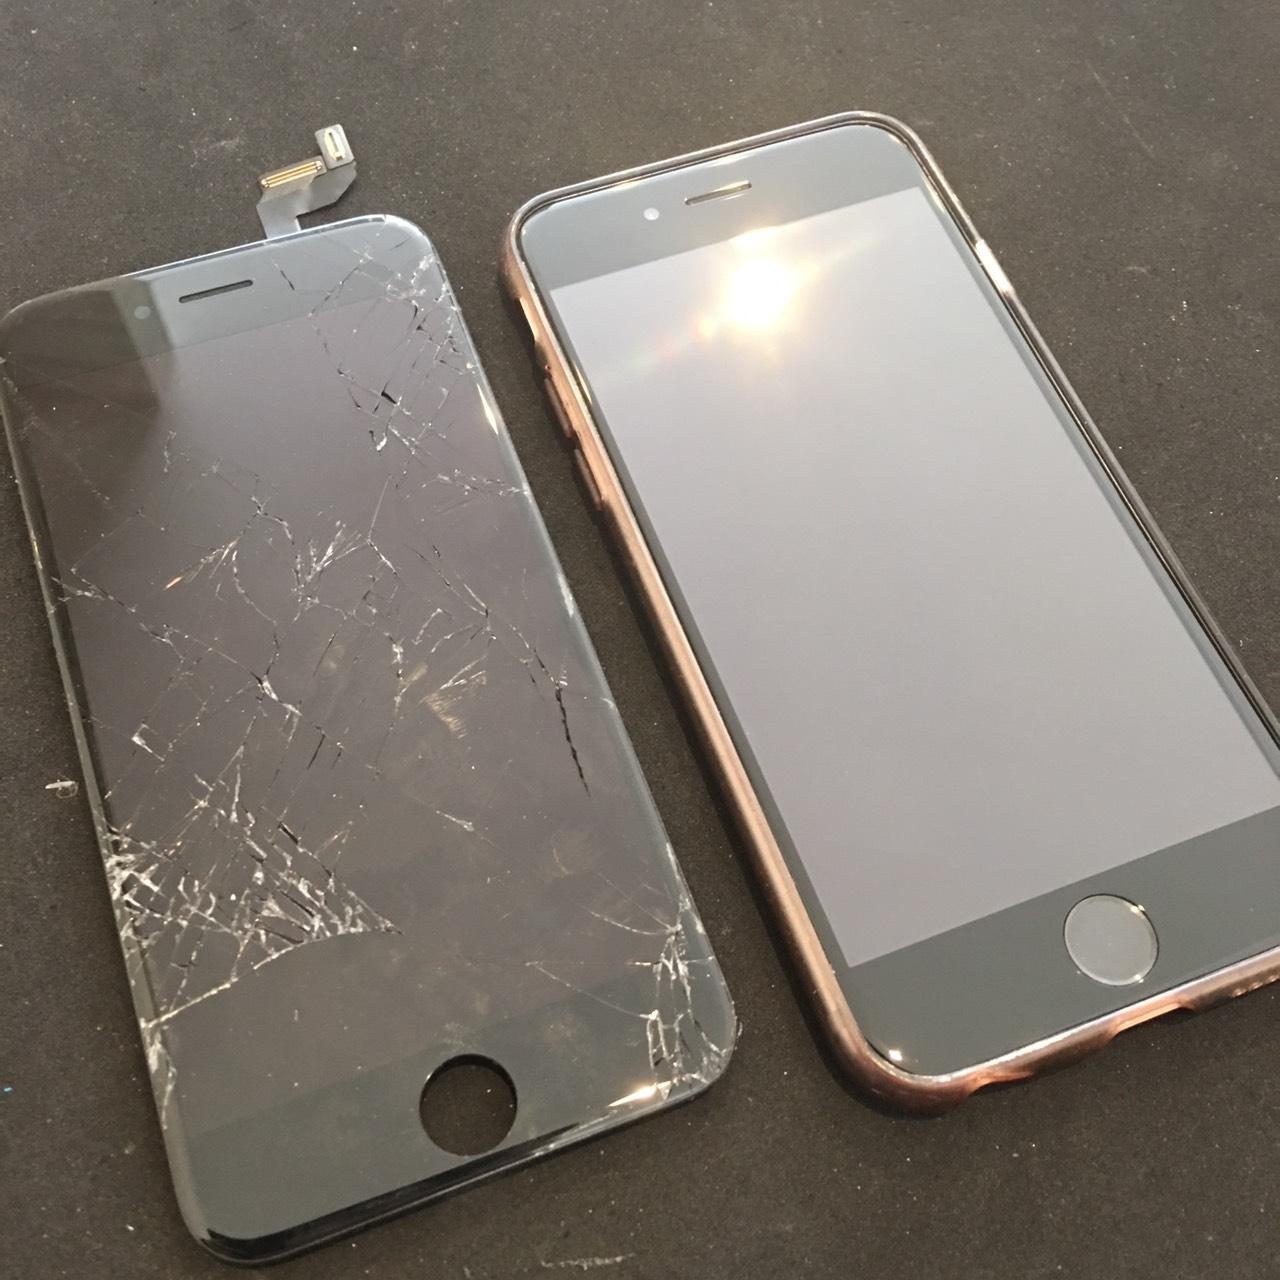 0407|iPhone6s|液晶パネル交換修理